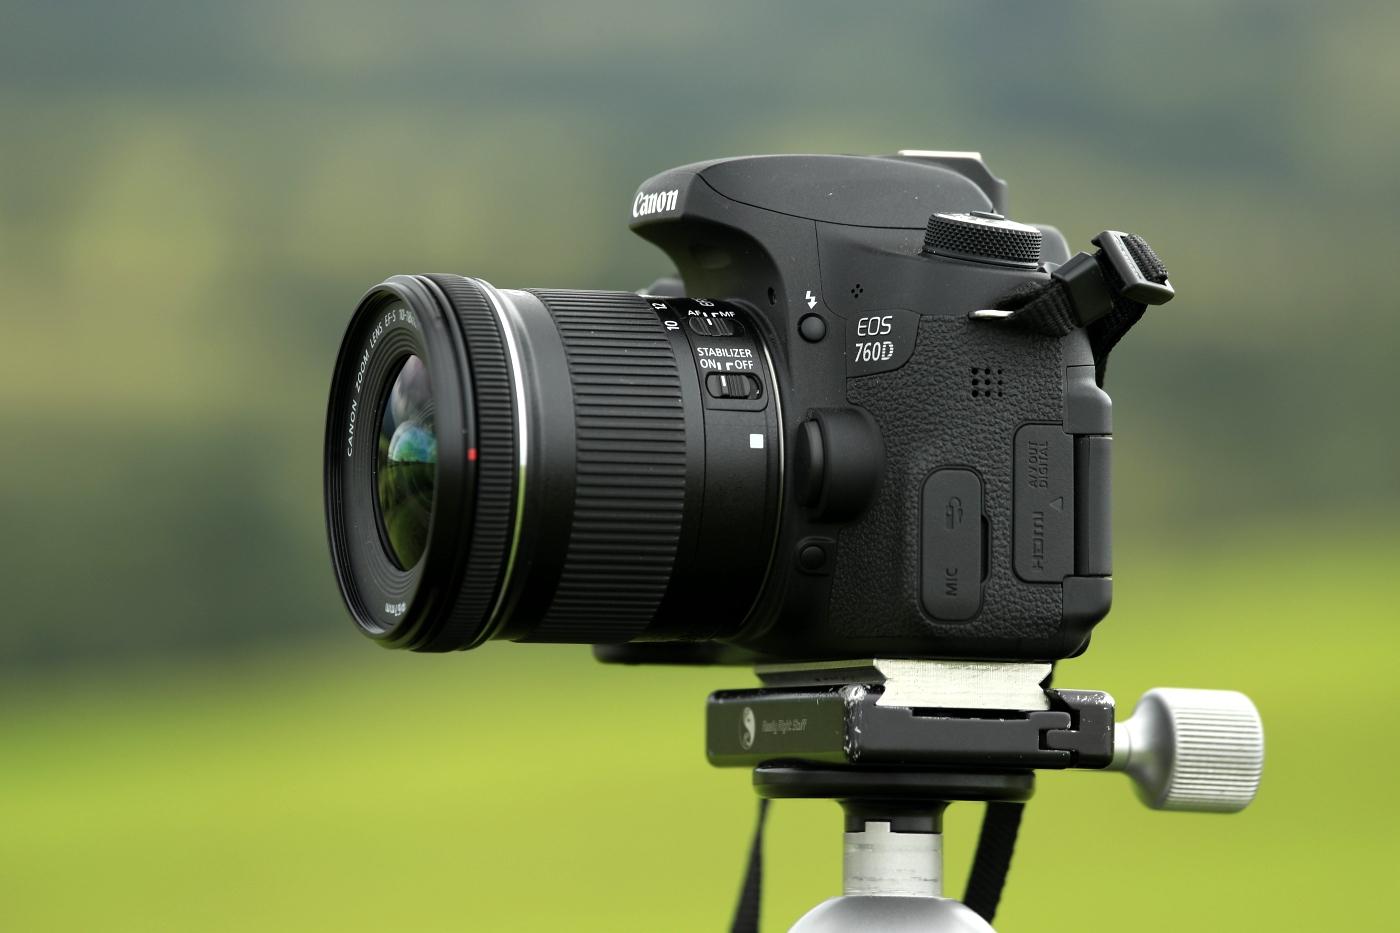 Canon EF-S 10-18mm f/4.5-5.6 IS STM; recenze; objektiv